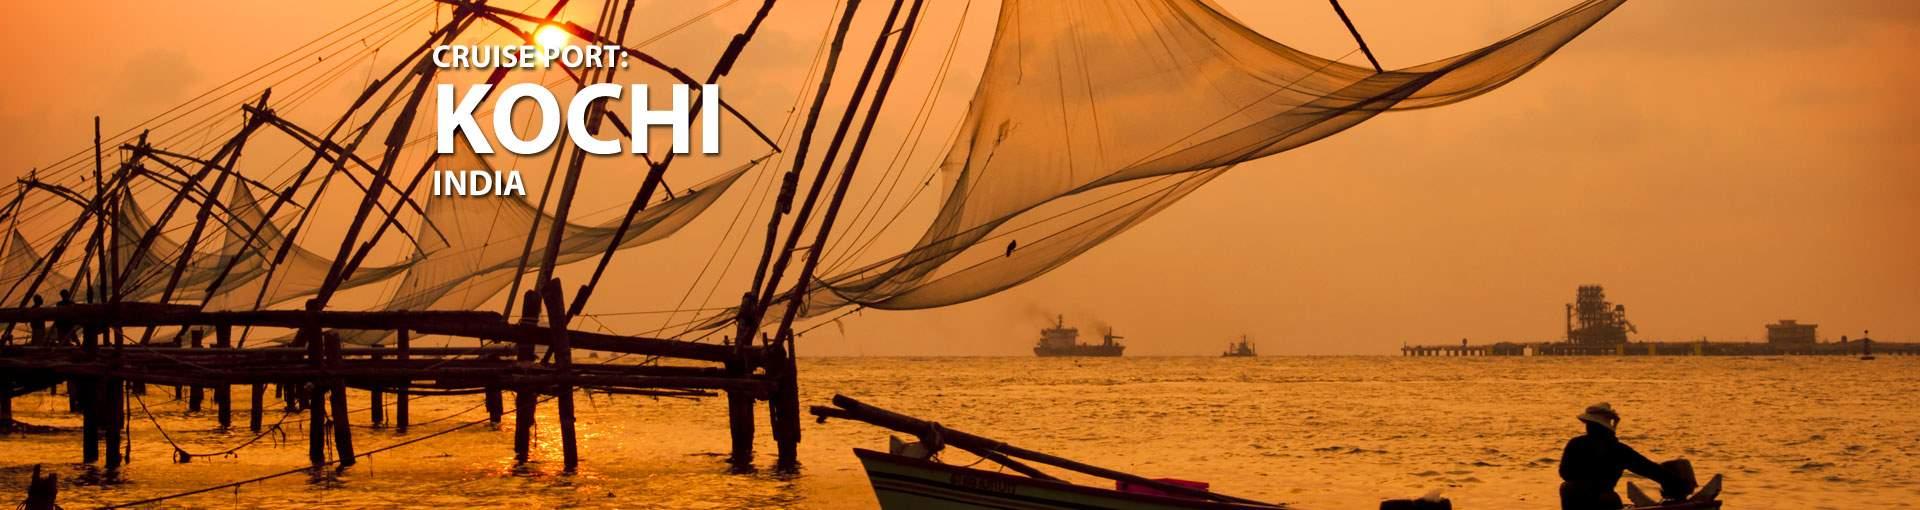 Cruises to Kochi, India